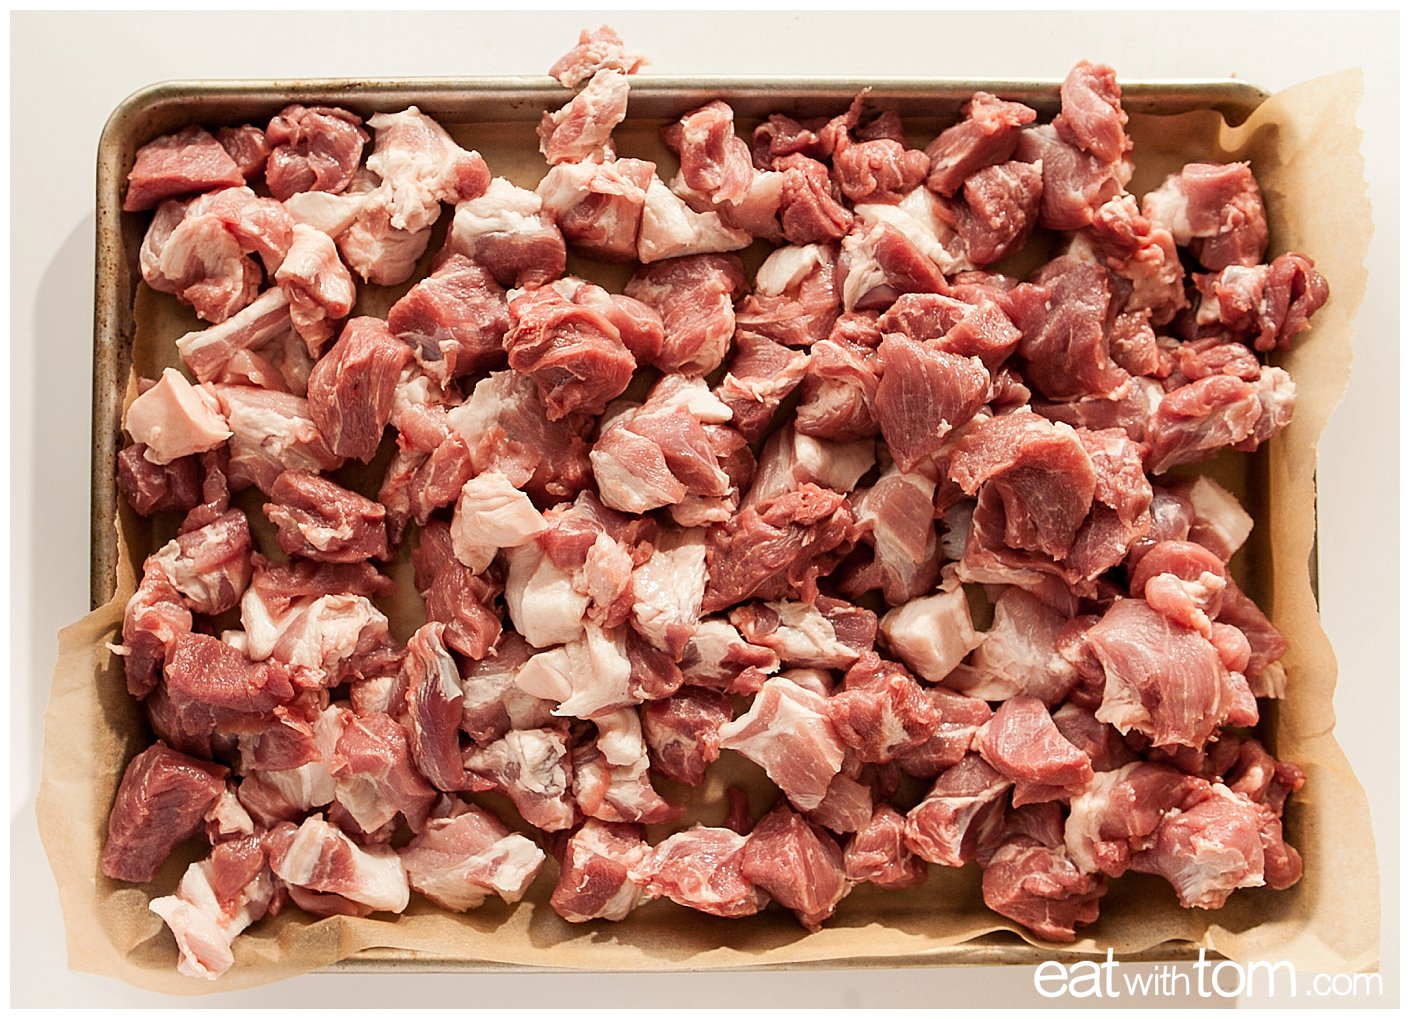 Cut up pork butt to make chorizo sausage spice recipe - Sausage Making - Artisan Skills